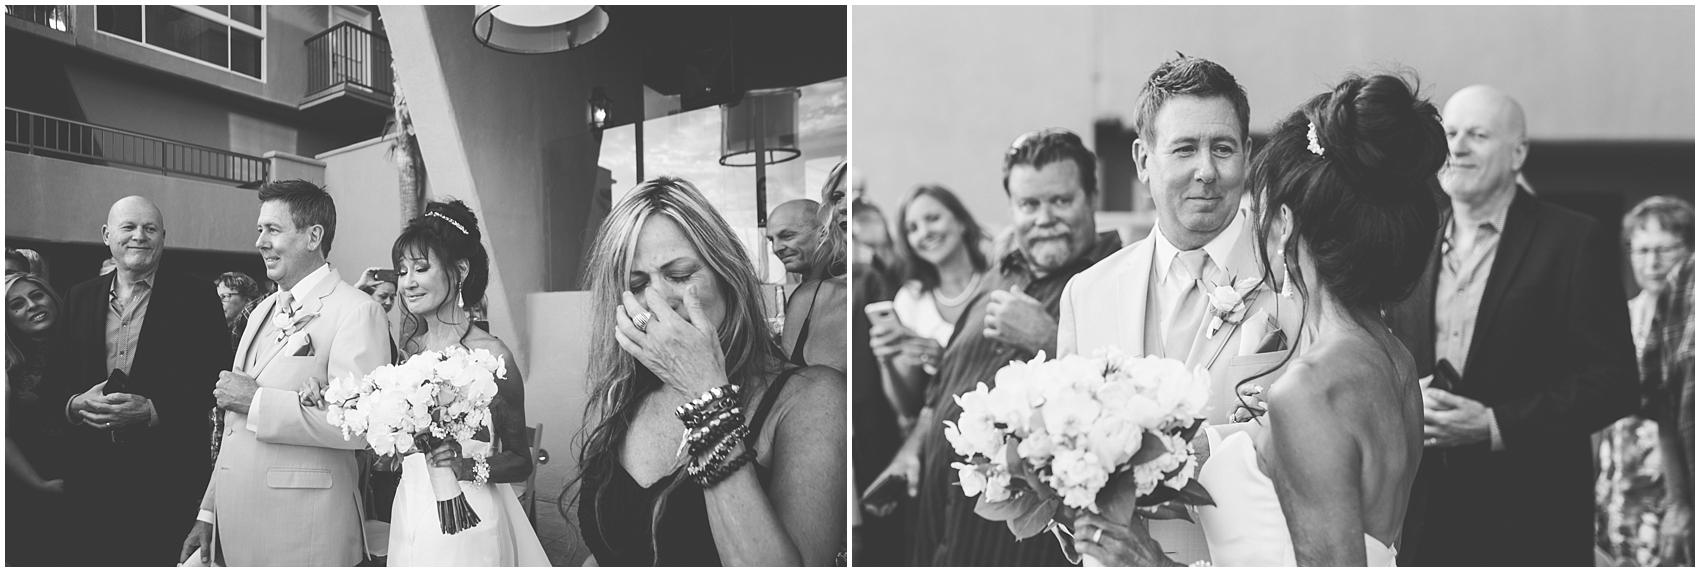 Rena and Louis_ Wedding-0362.jpg